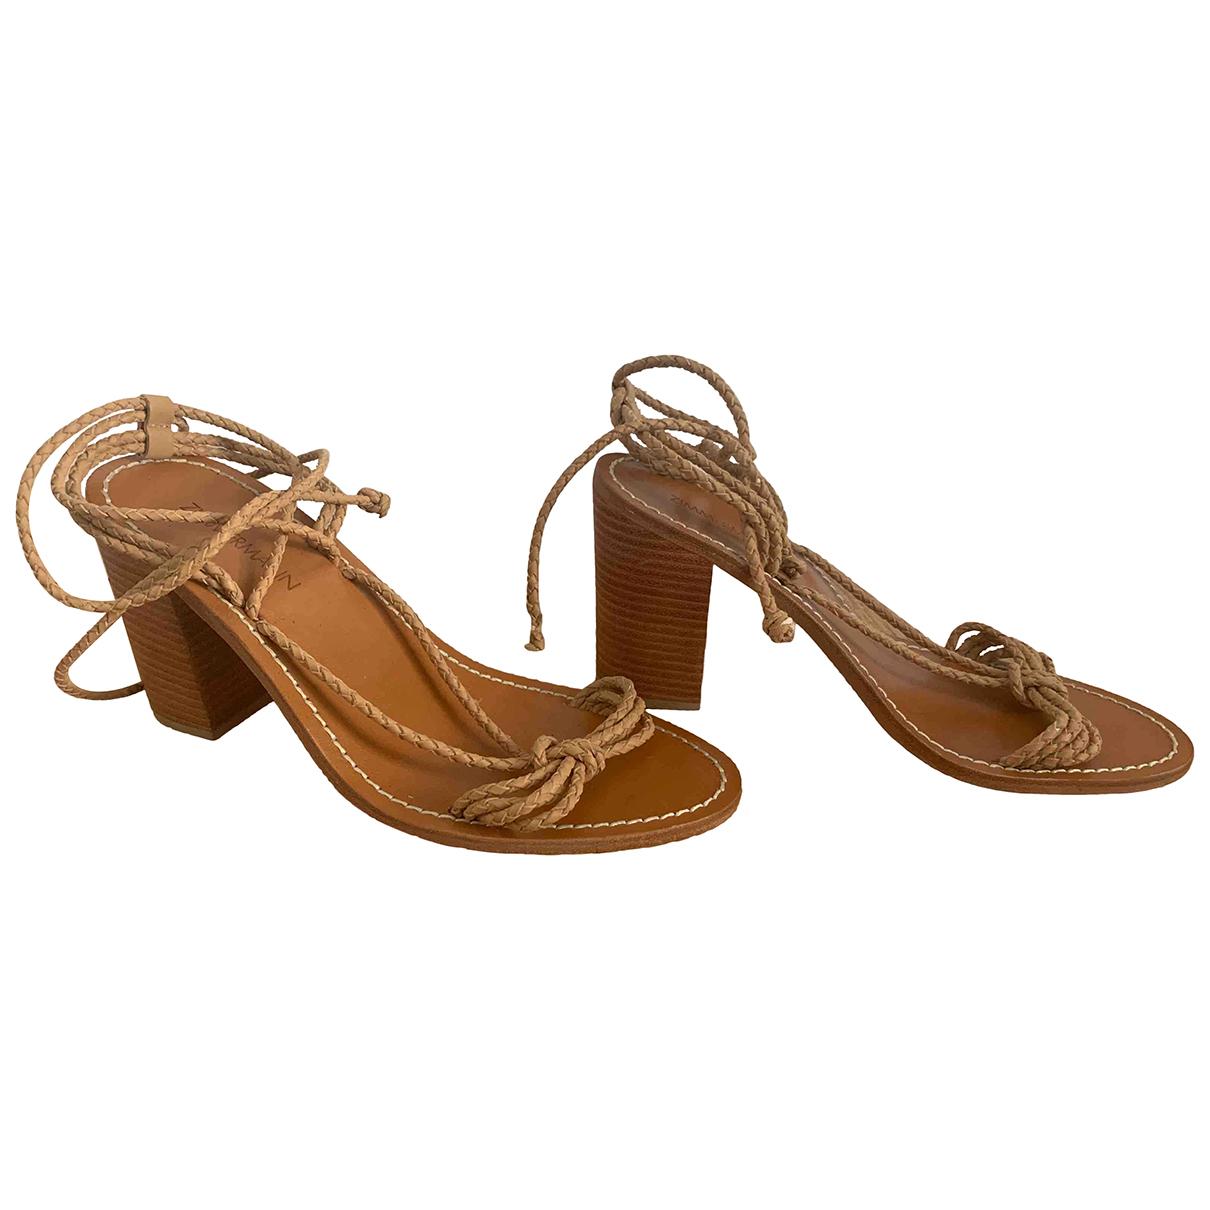 Zimmermann \N Brown Leather Sandals for Women 39 EU